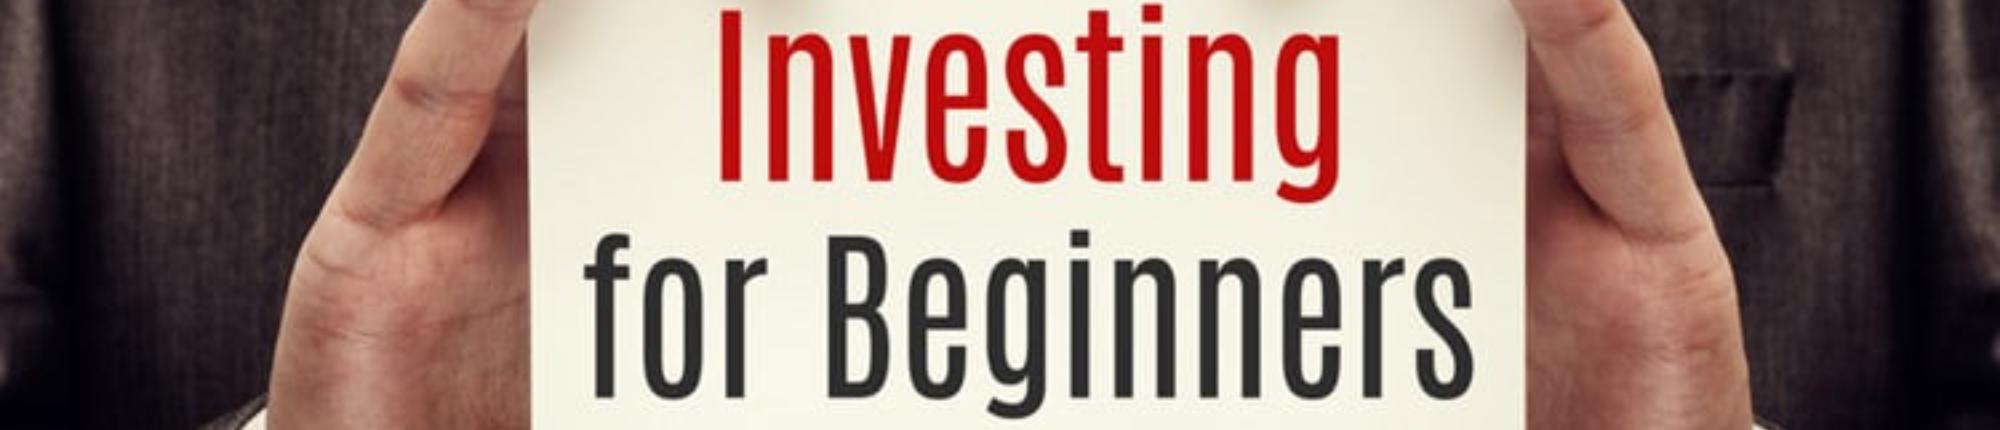 Investing 1.0.1.